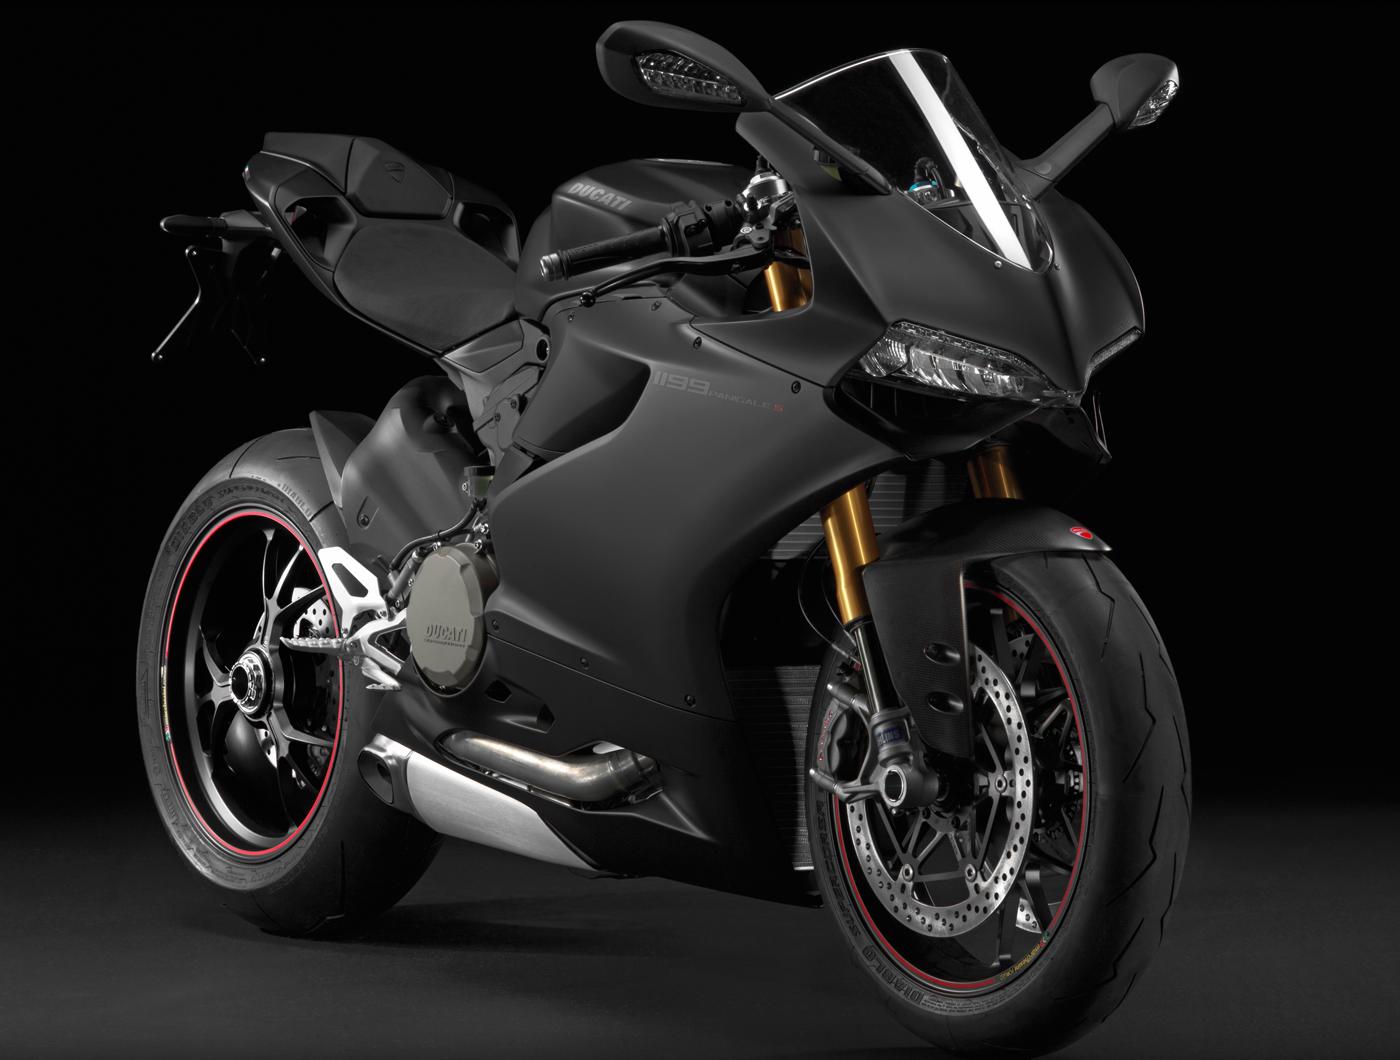 2014 ducati superbike 1199 panigale s specs motorsport galleries. Black Bedroom Furniture Sets. Home Design Ideas